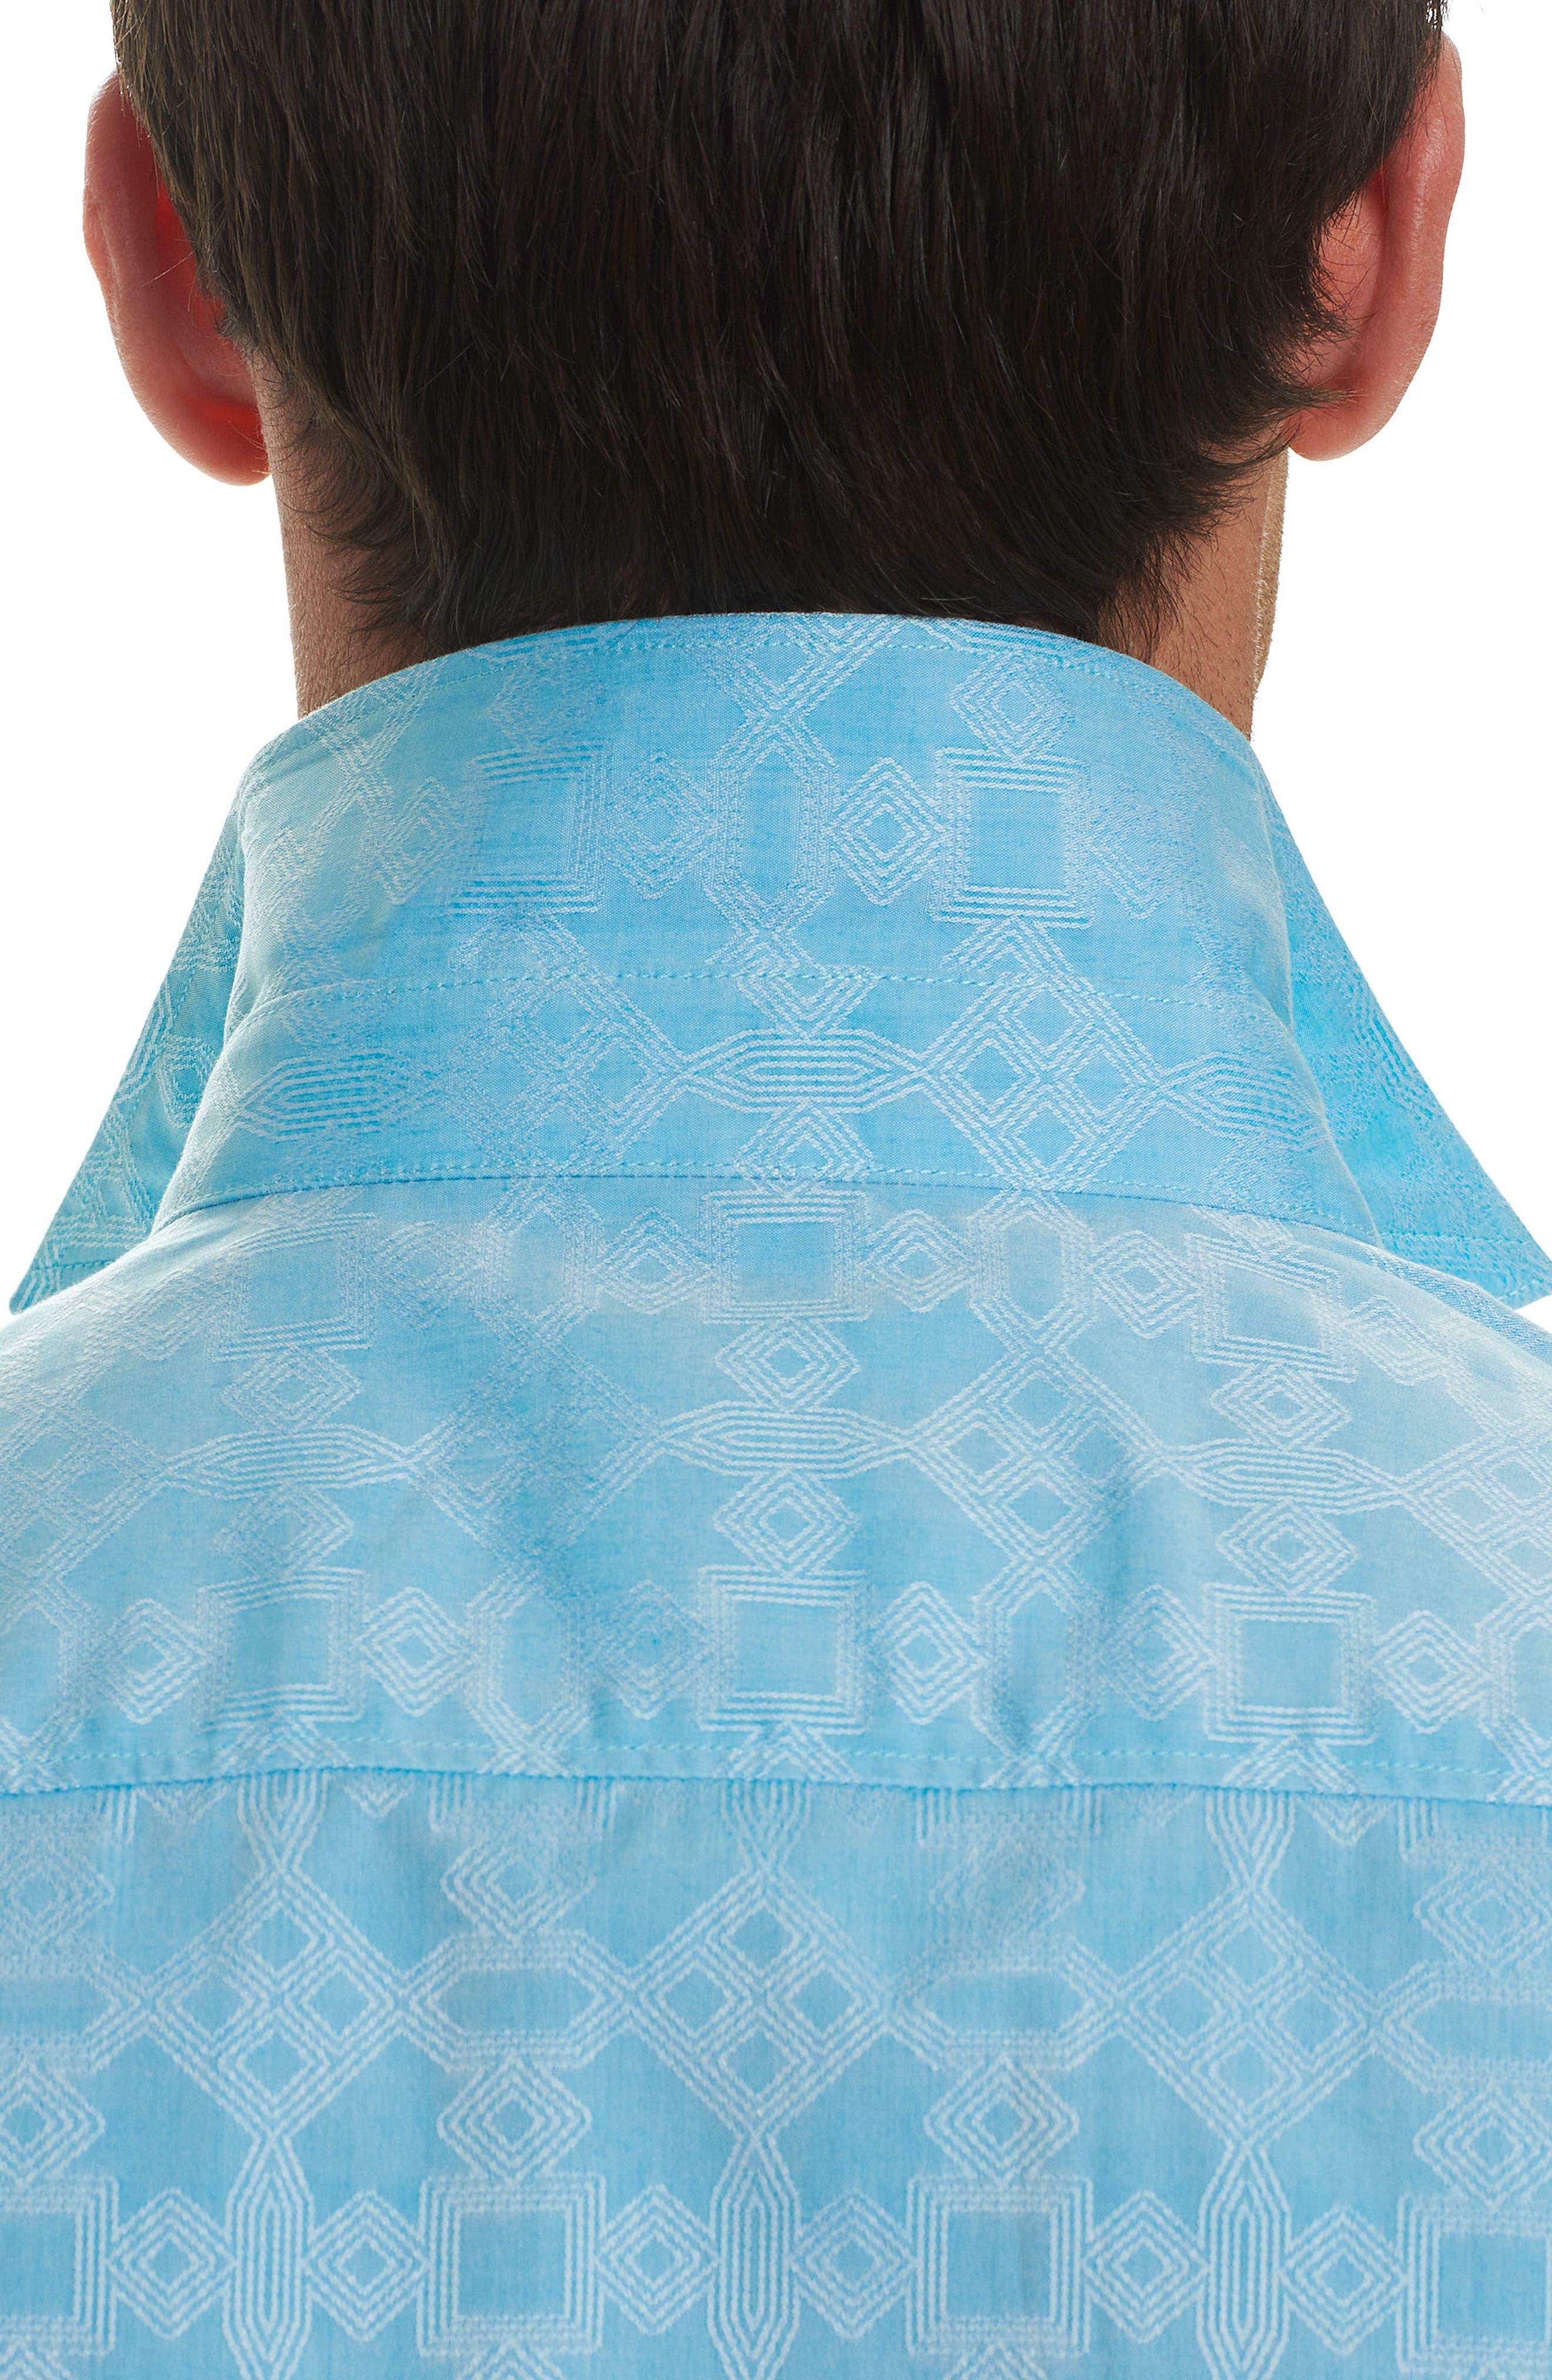 Maya Bay Classic Fit Jacquard Sport Shirt,                             Alternate thumbnail 3, color,                             Turquoise